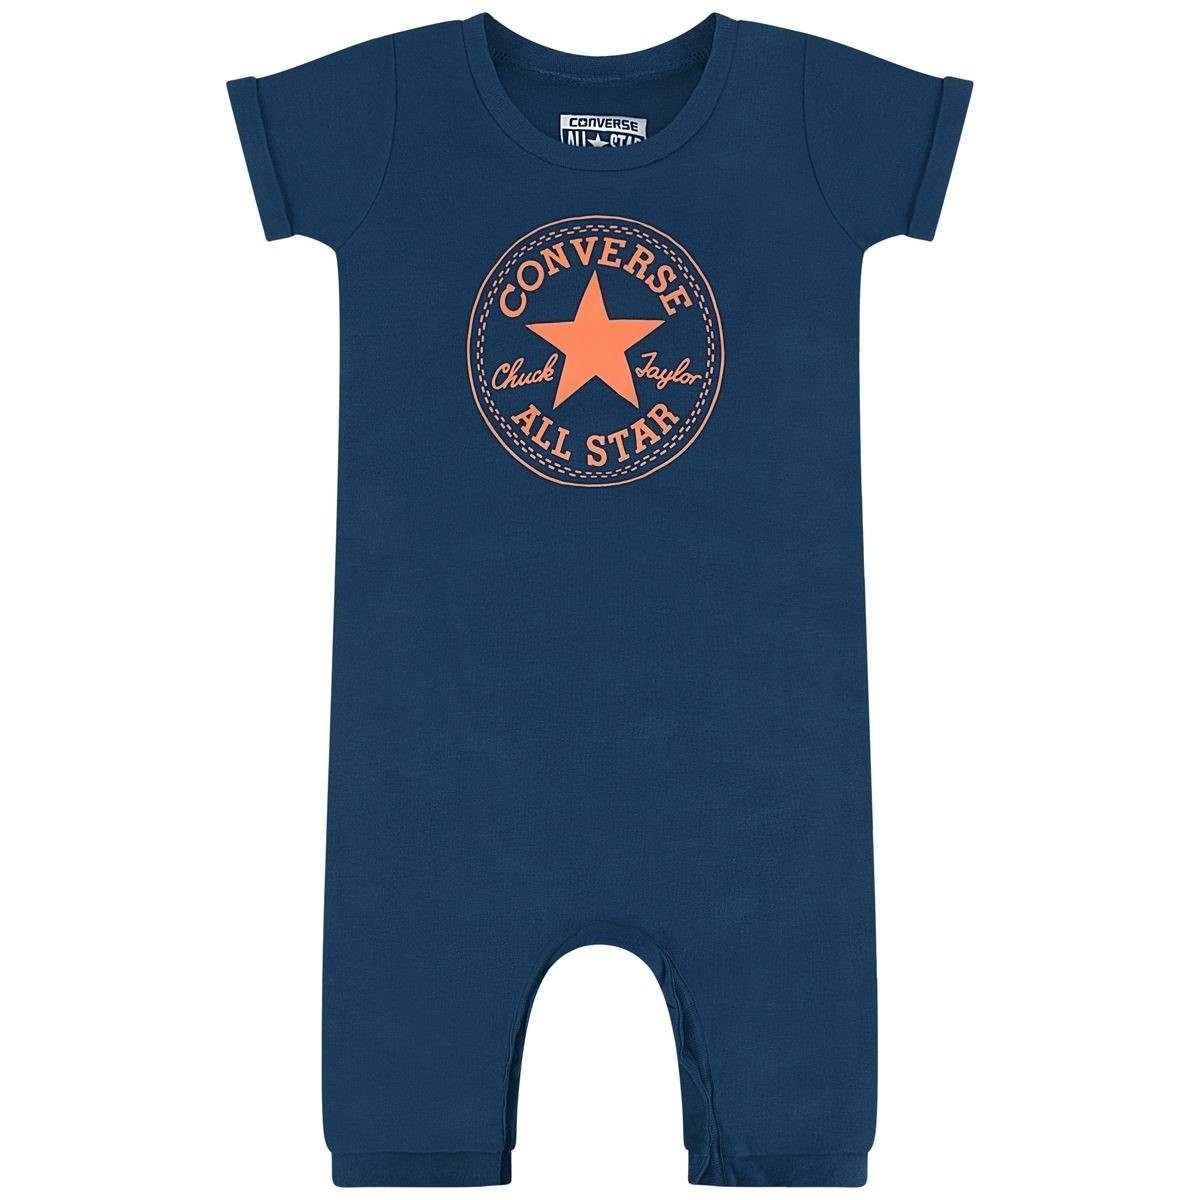 Converse Baby Boys Navy All Star Romper